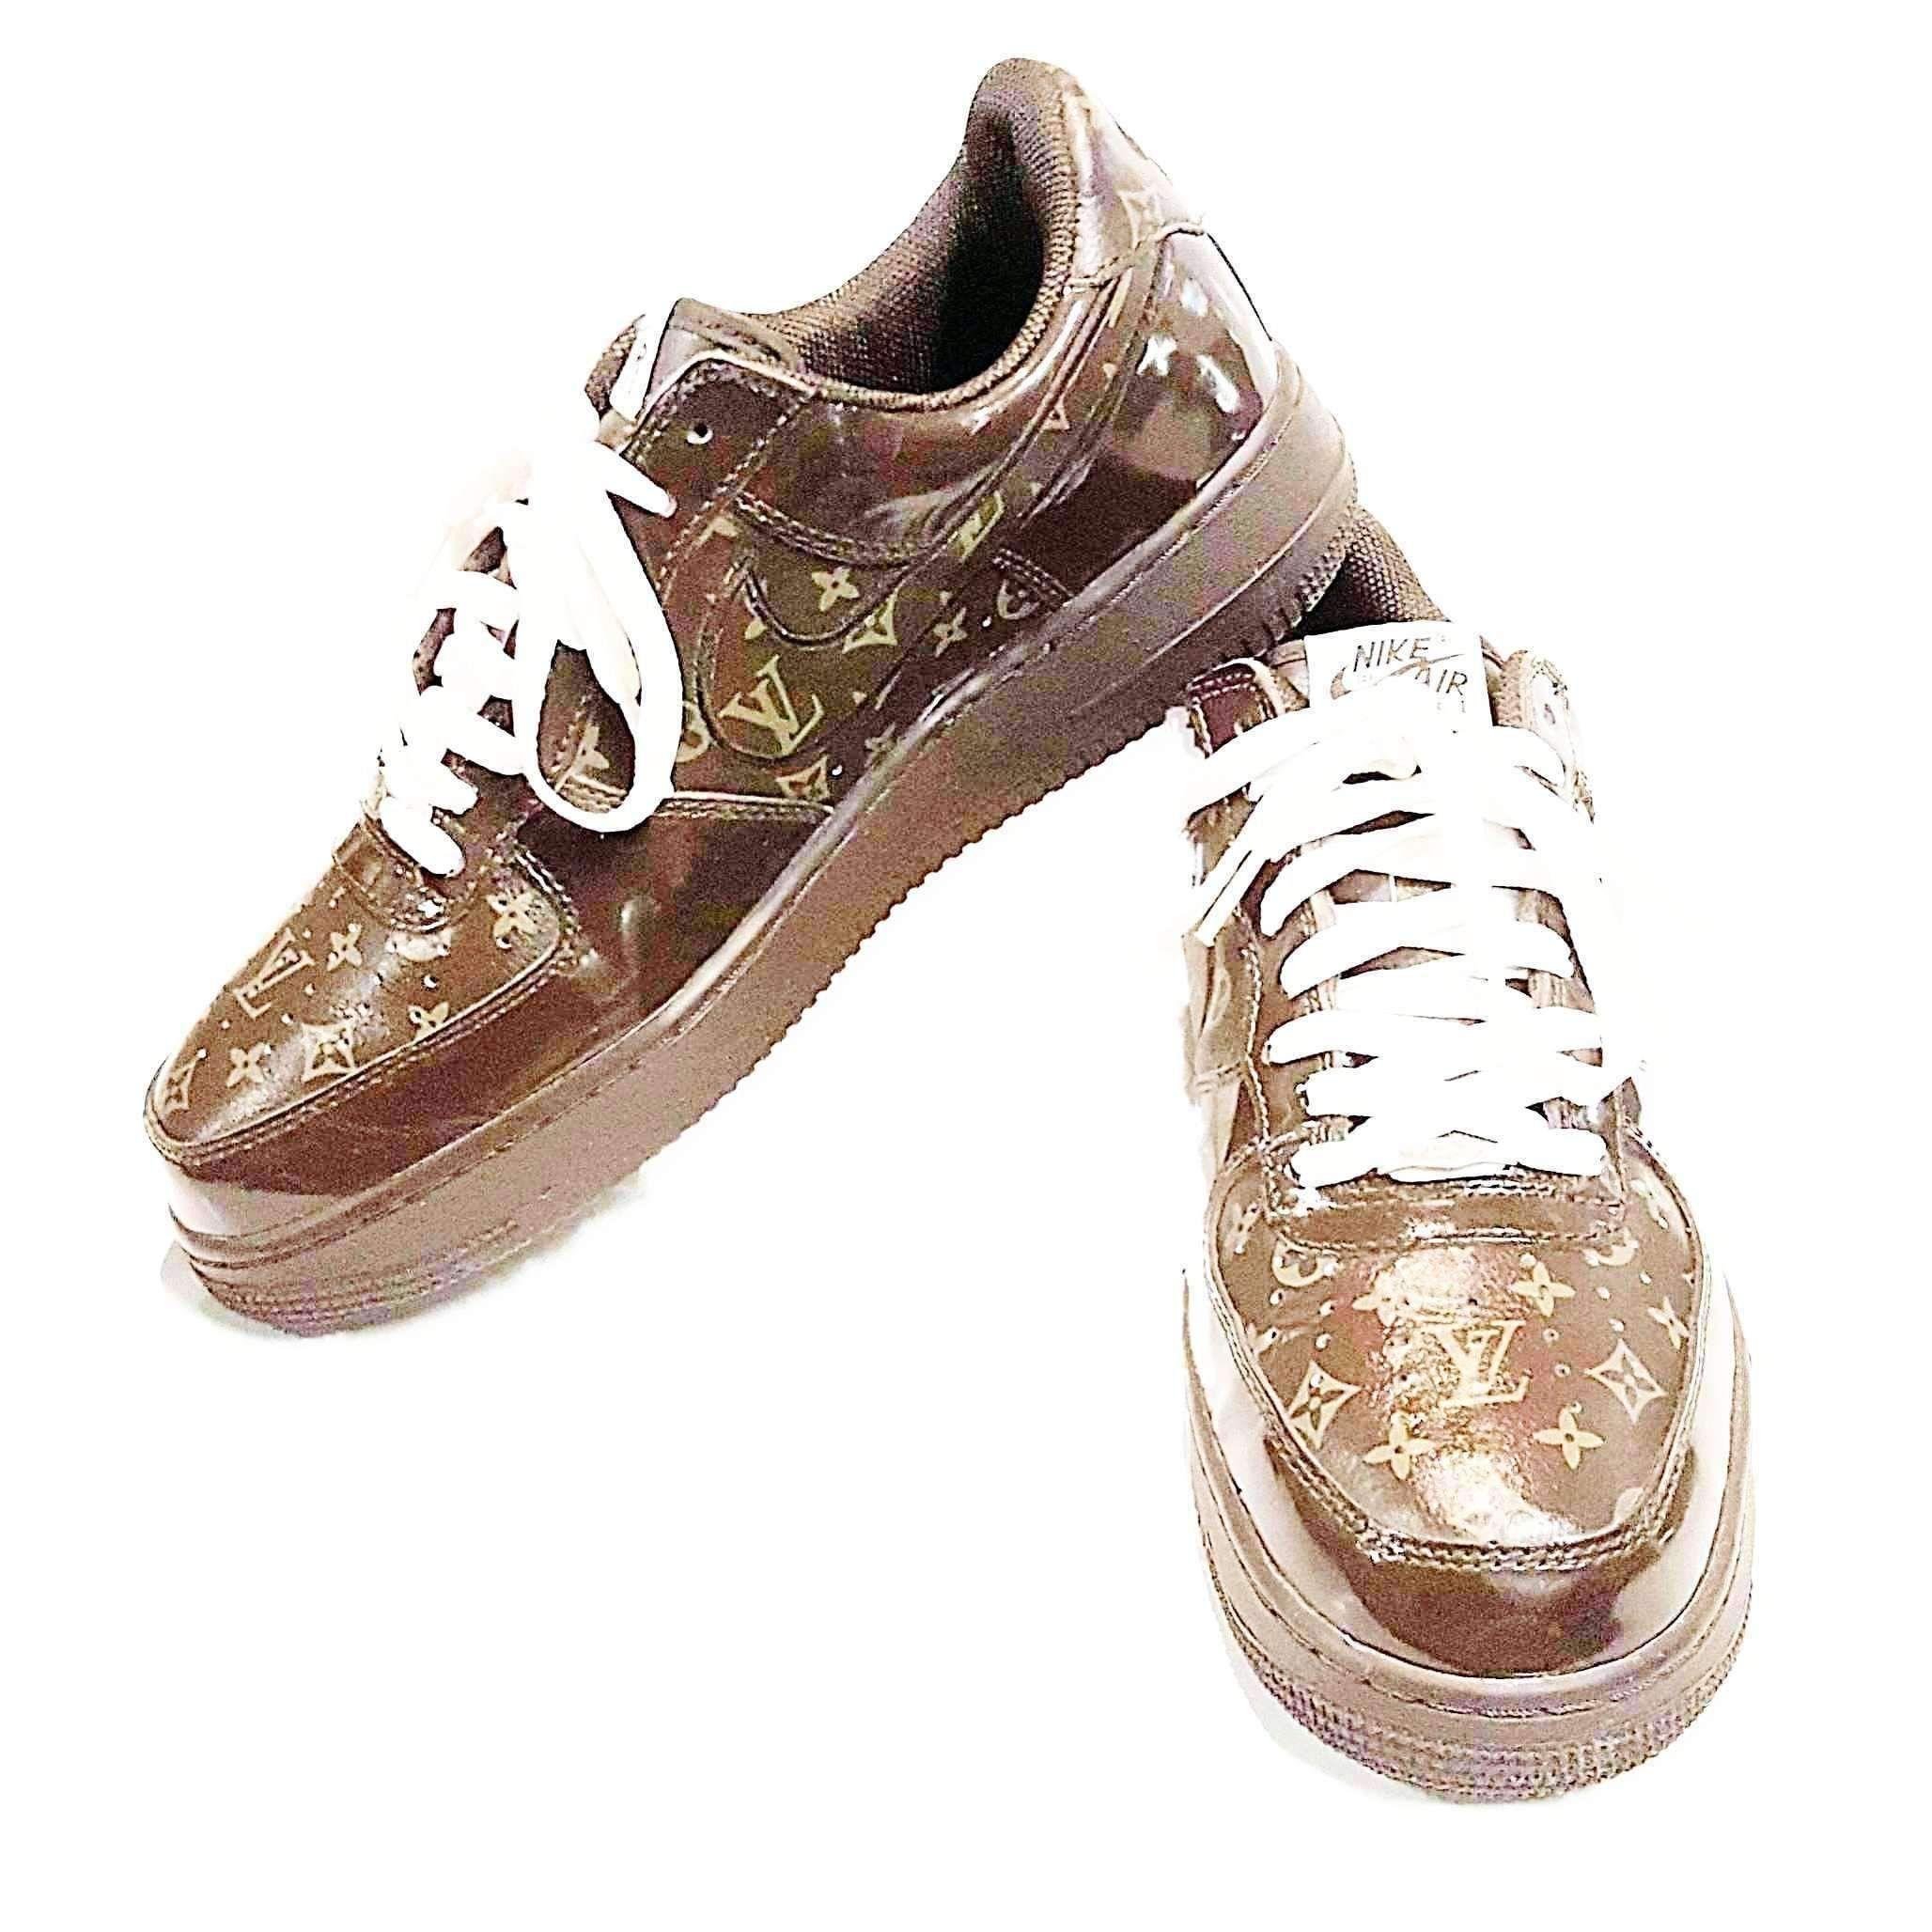 Nike Air Force X Louis Vuitton Men Sneakers Size 10